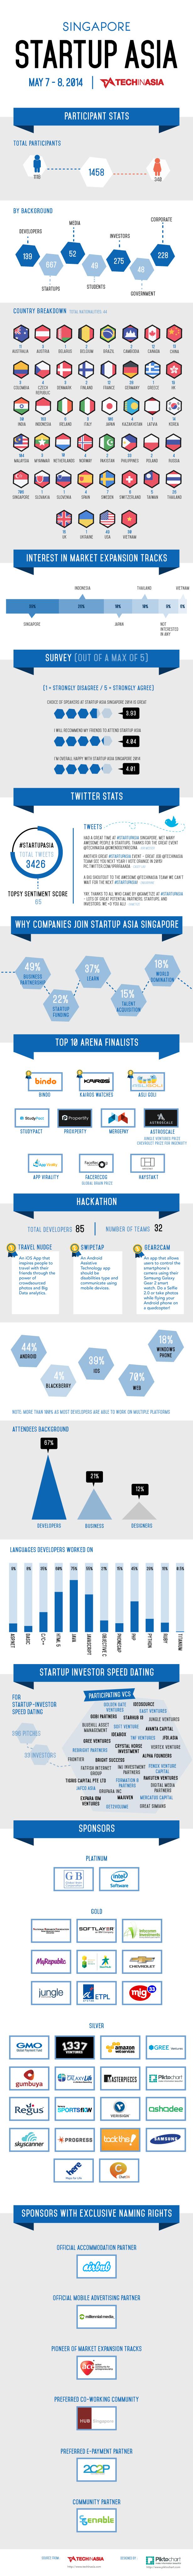 Startup Asia Singapore 2014 Infographic